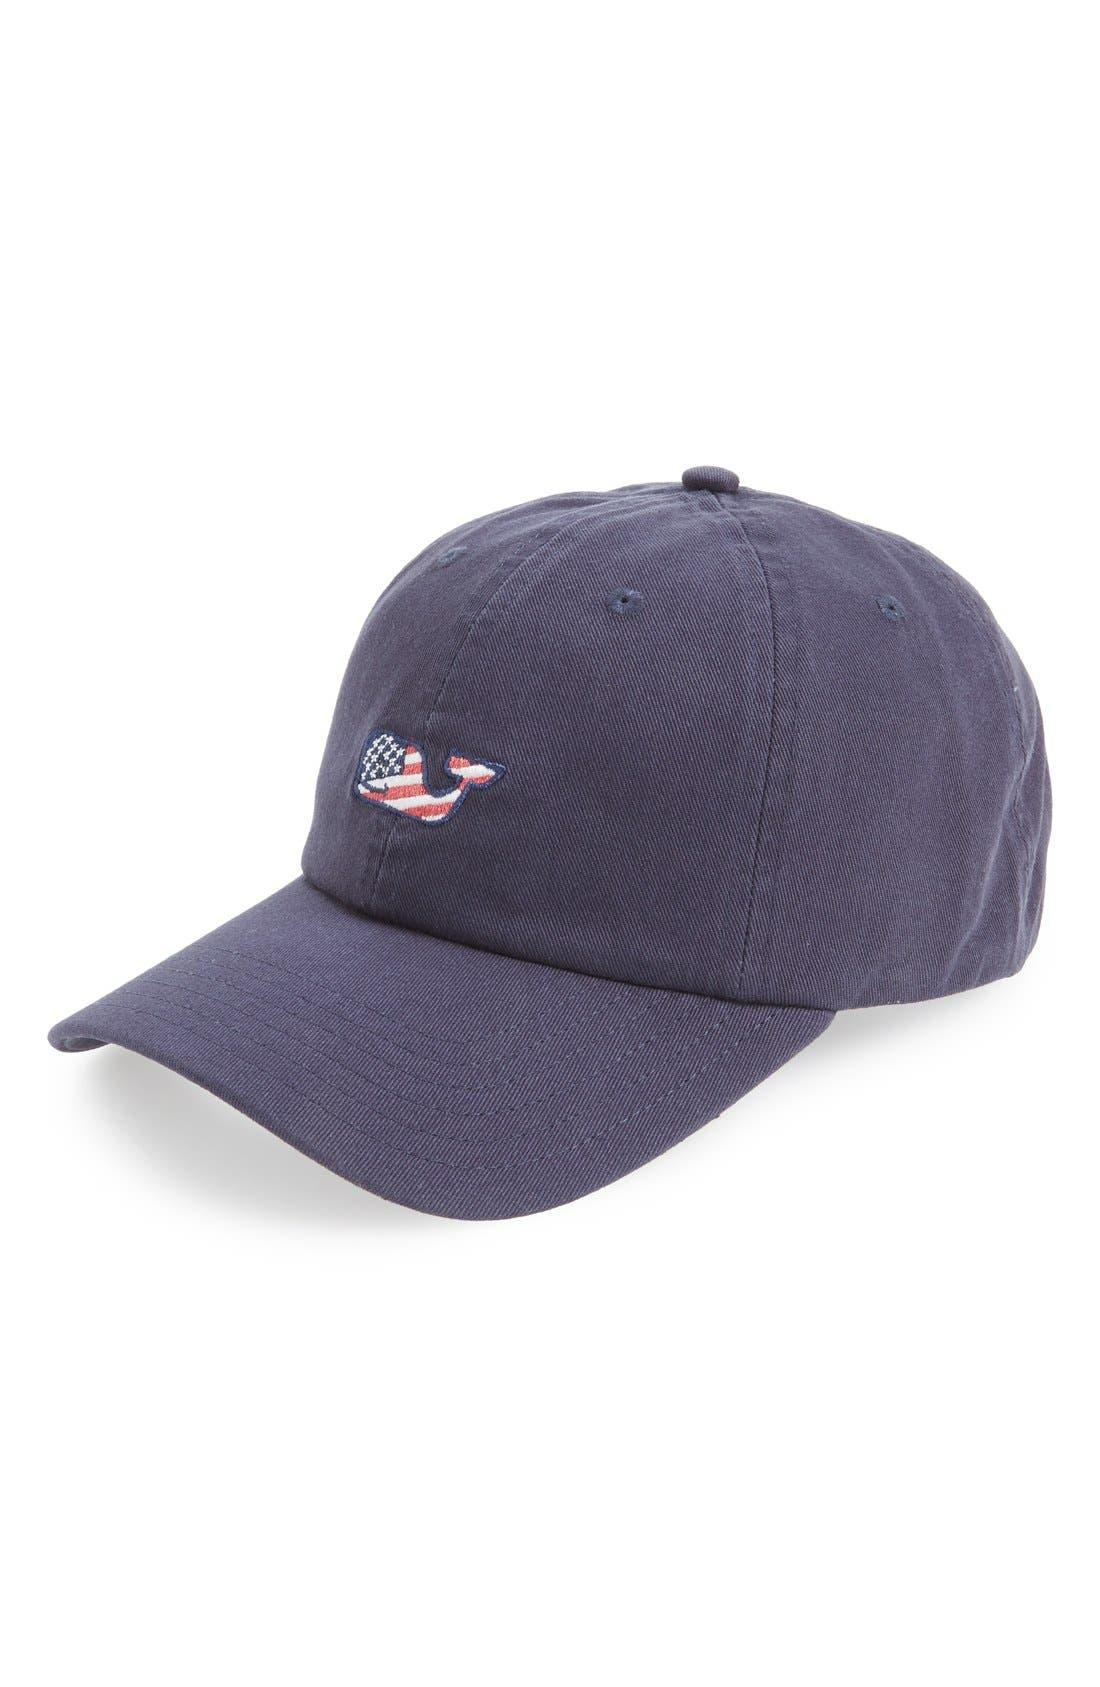 Main Image - Vineyard Vines 'Whale Flag' Baseball Cap